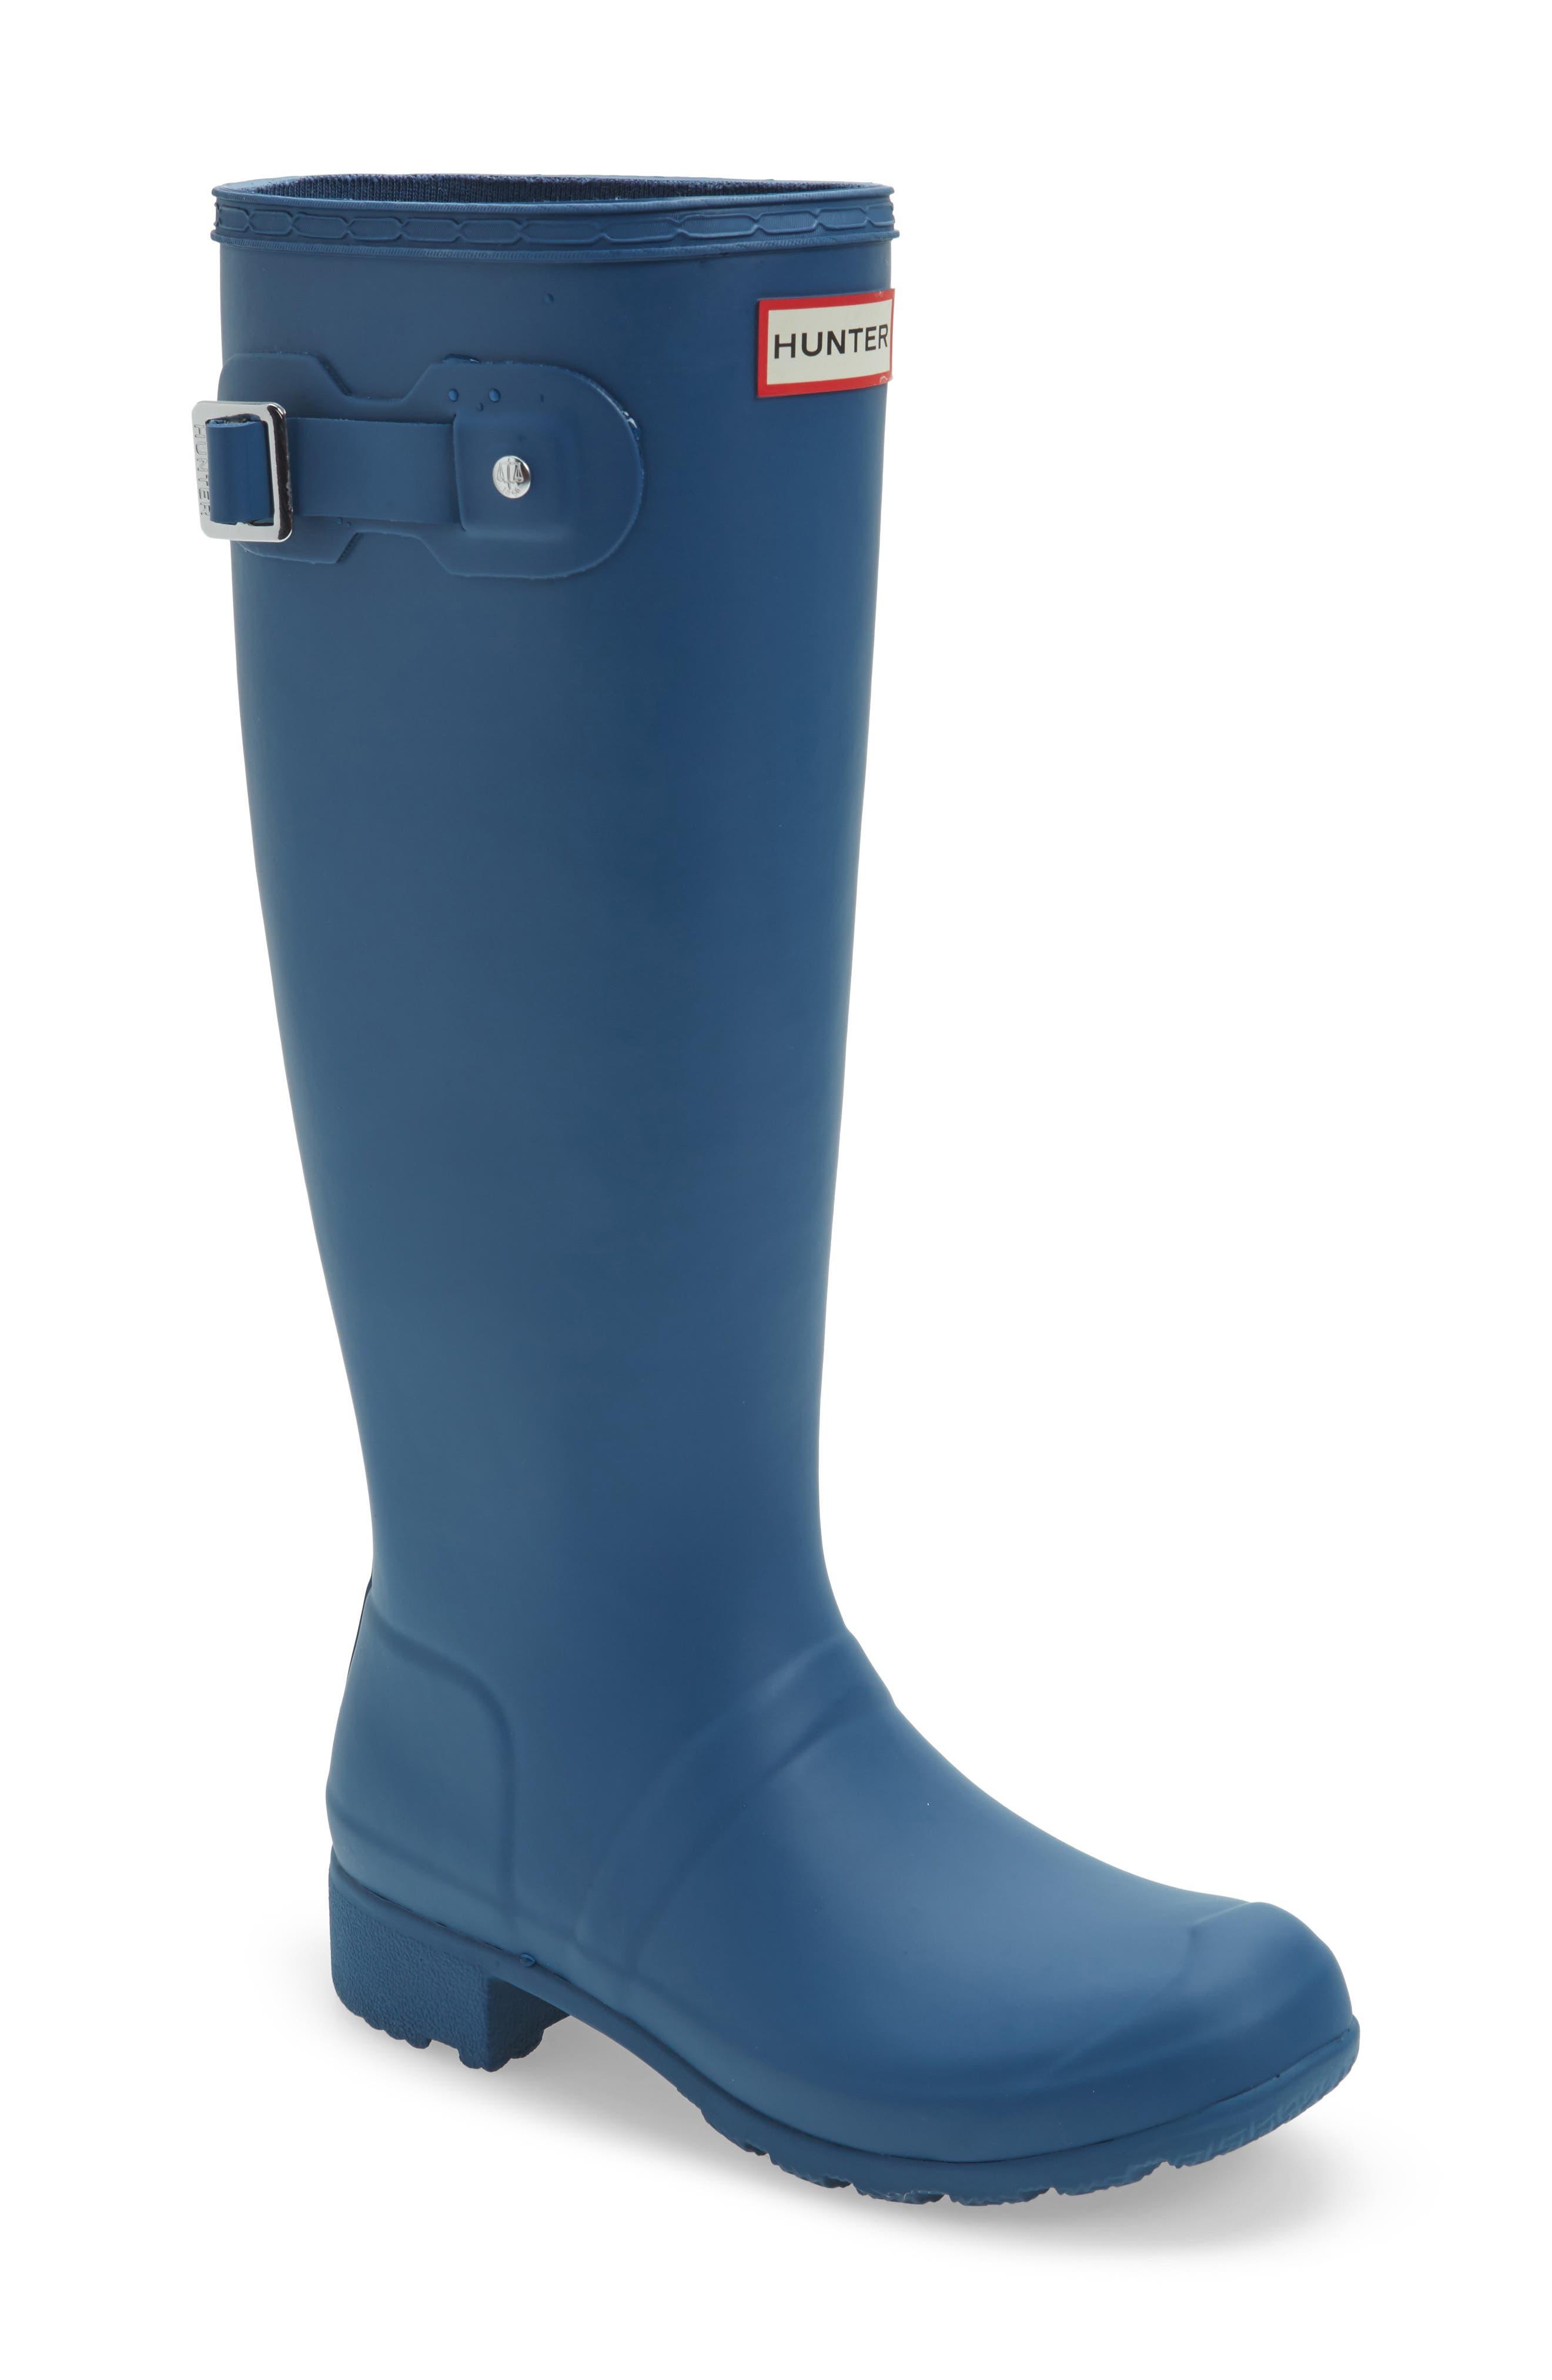 Hunter Tour Packable Waterproof Rain Boot